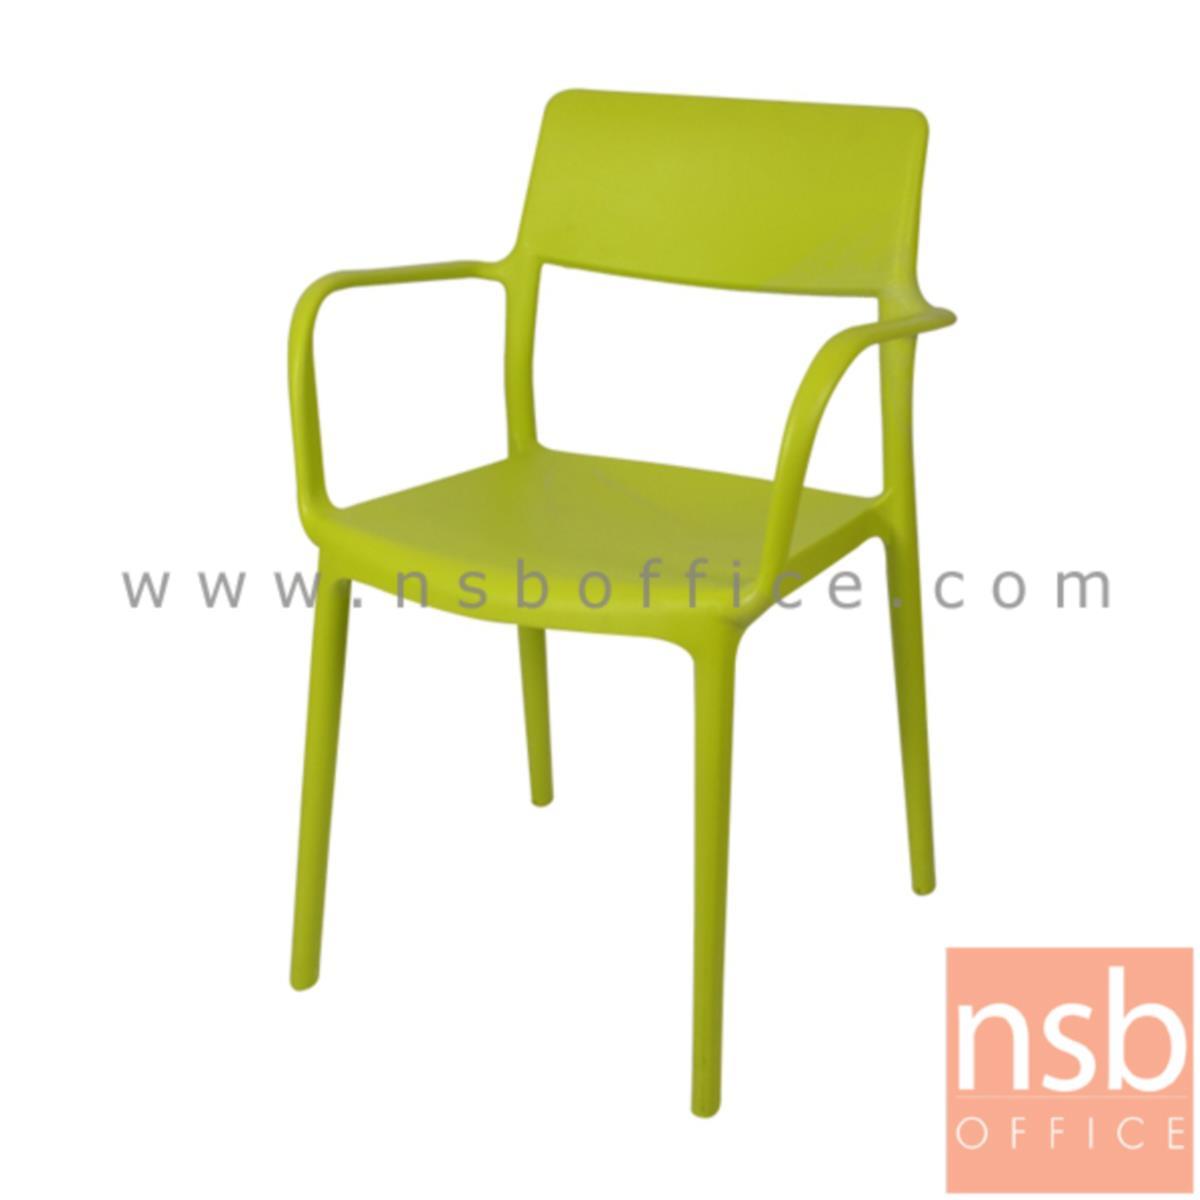 B11A031:เก้าอี้โมเดิร์นพลาสติก(PP)ล้วน รุ่น PIO-PN74 ขนาด 52W cm.